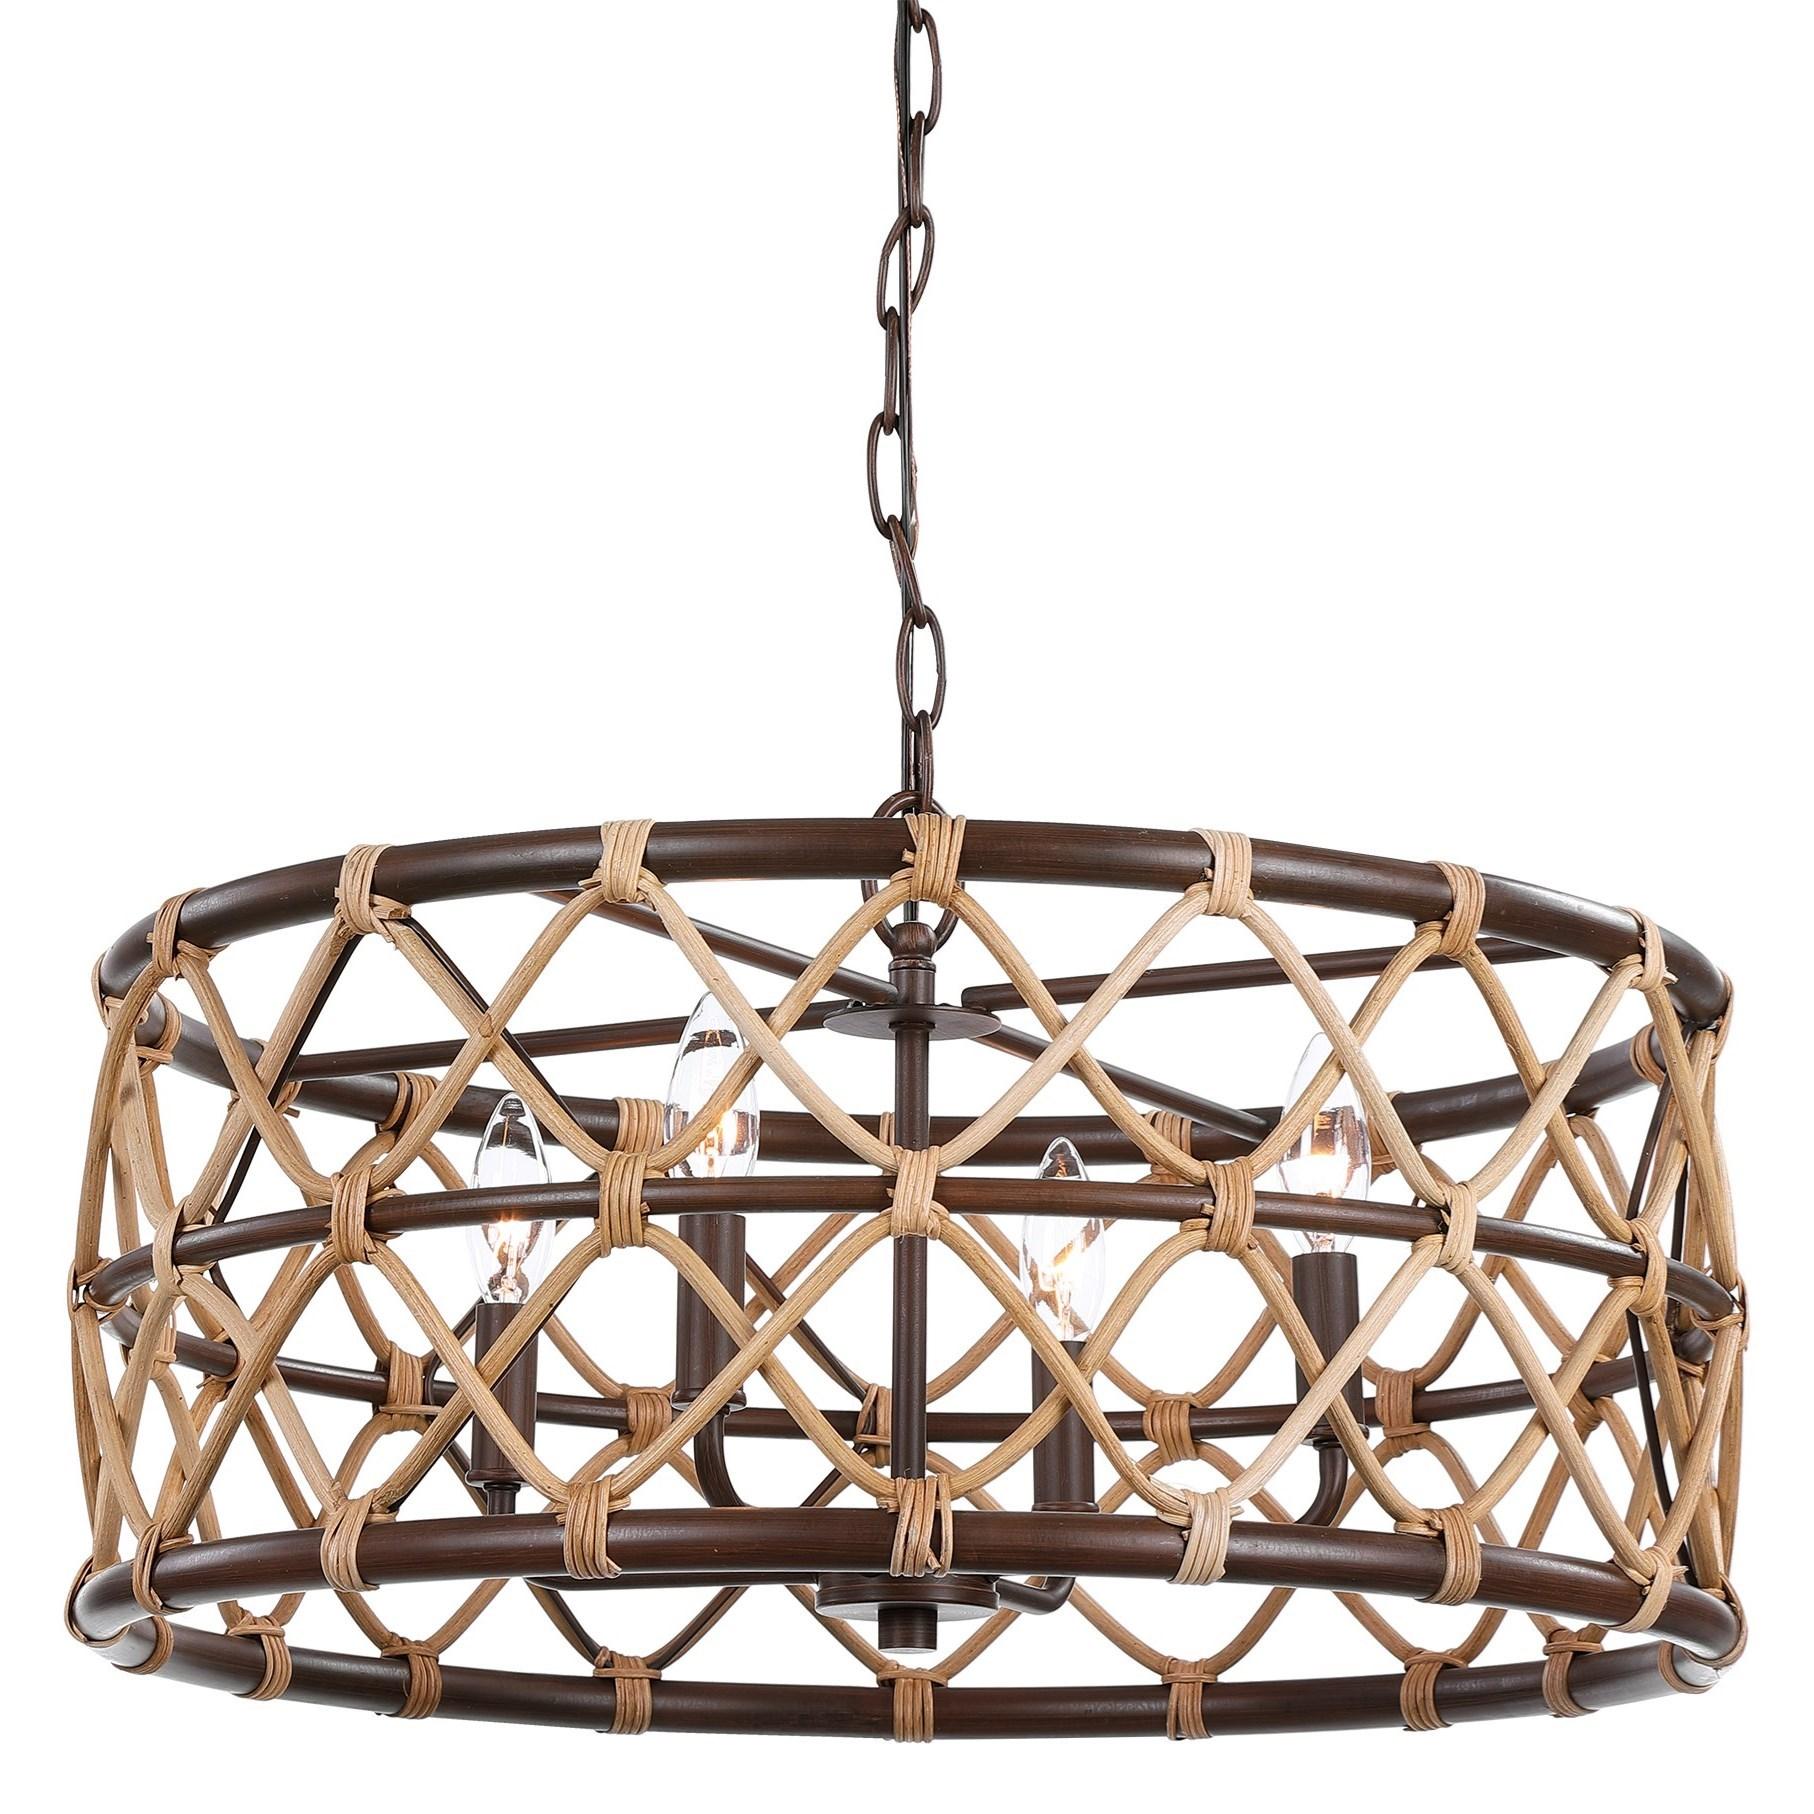 Lighting Fixtures - Pendant Lights Hilo 4 Light Drum Pendant by Uttermost at Upper Room Home Furnishings